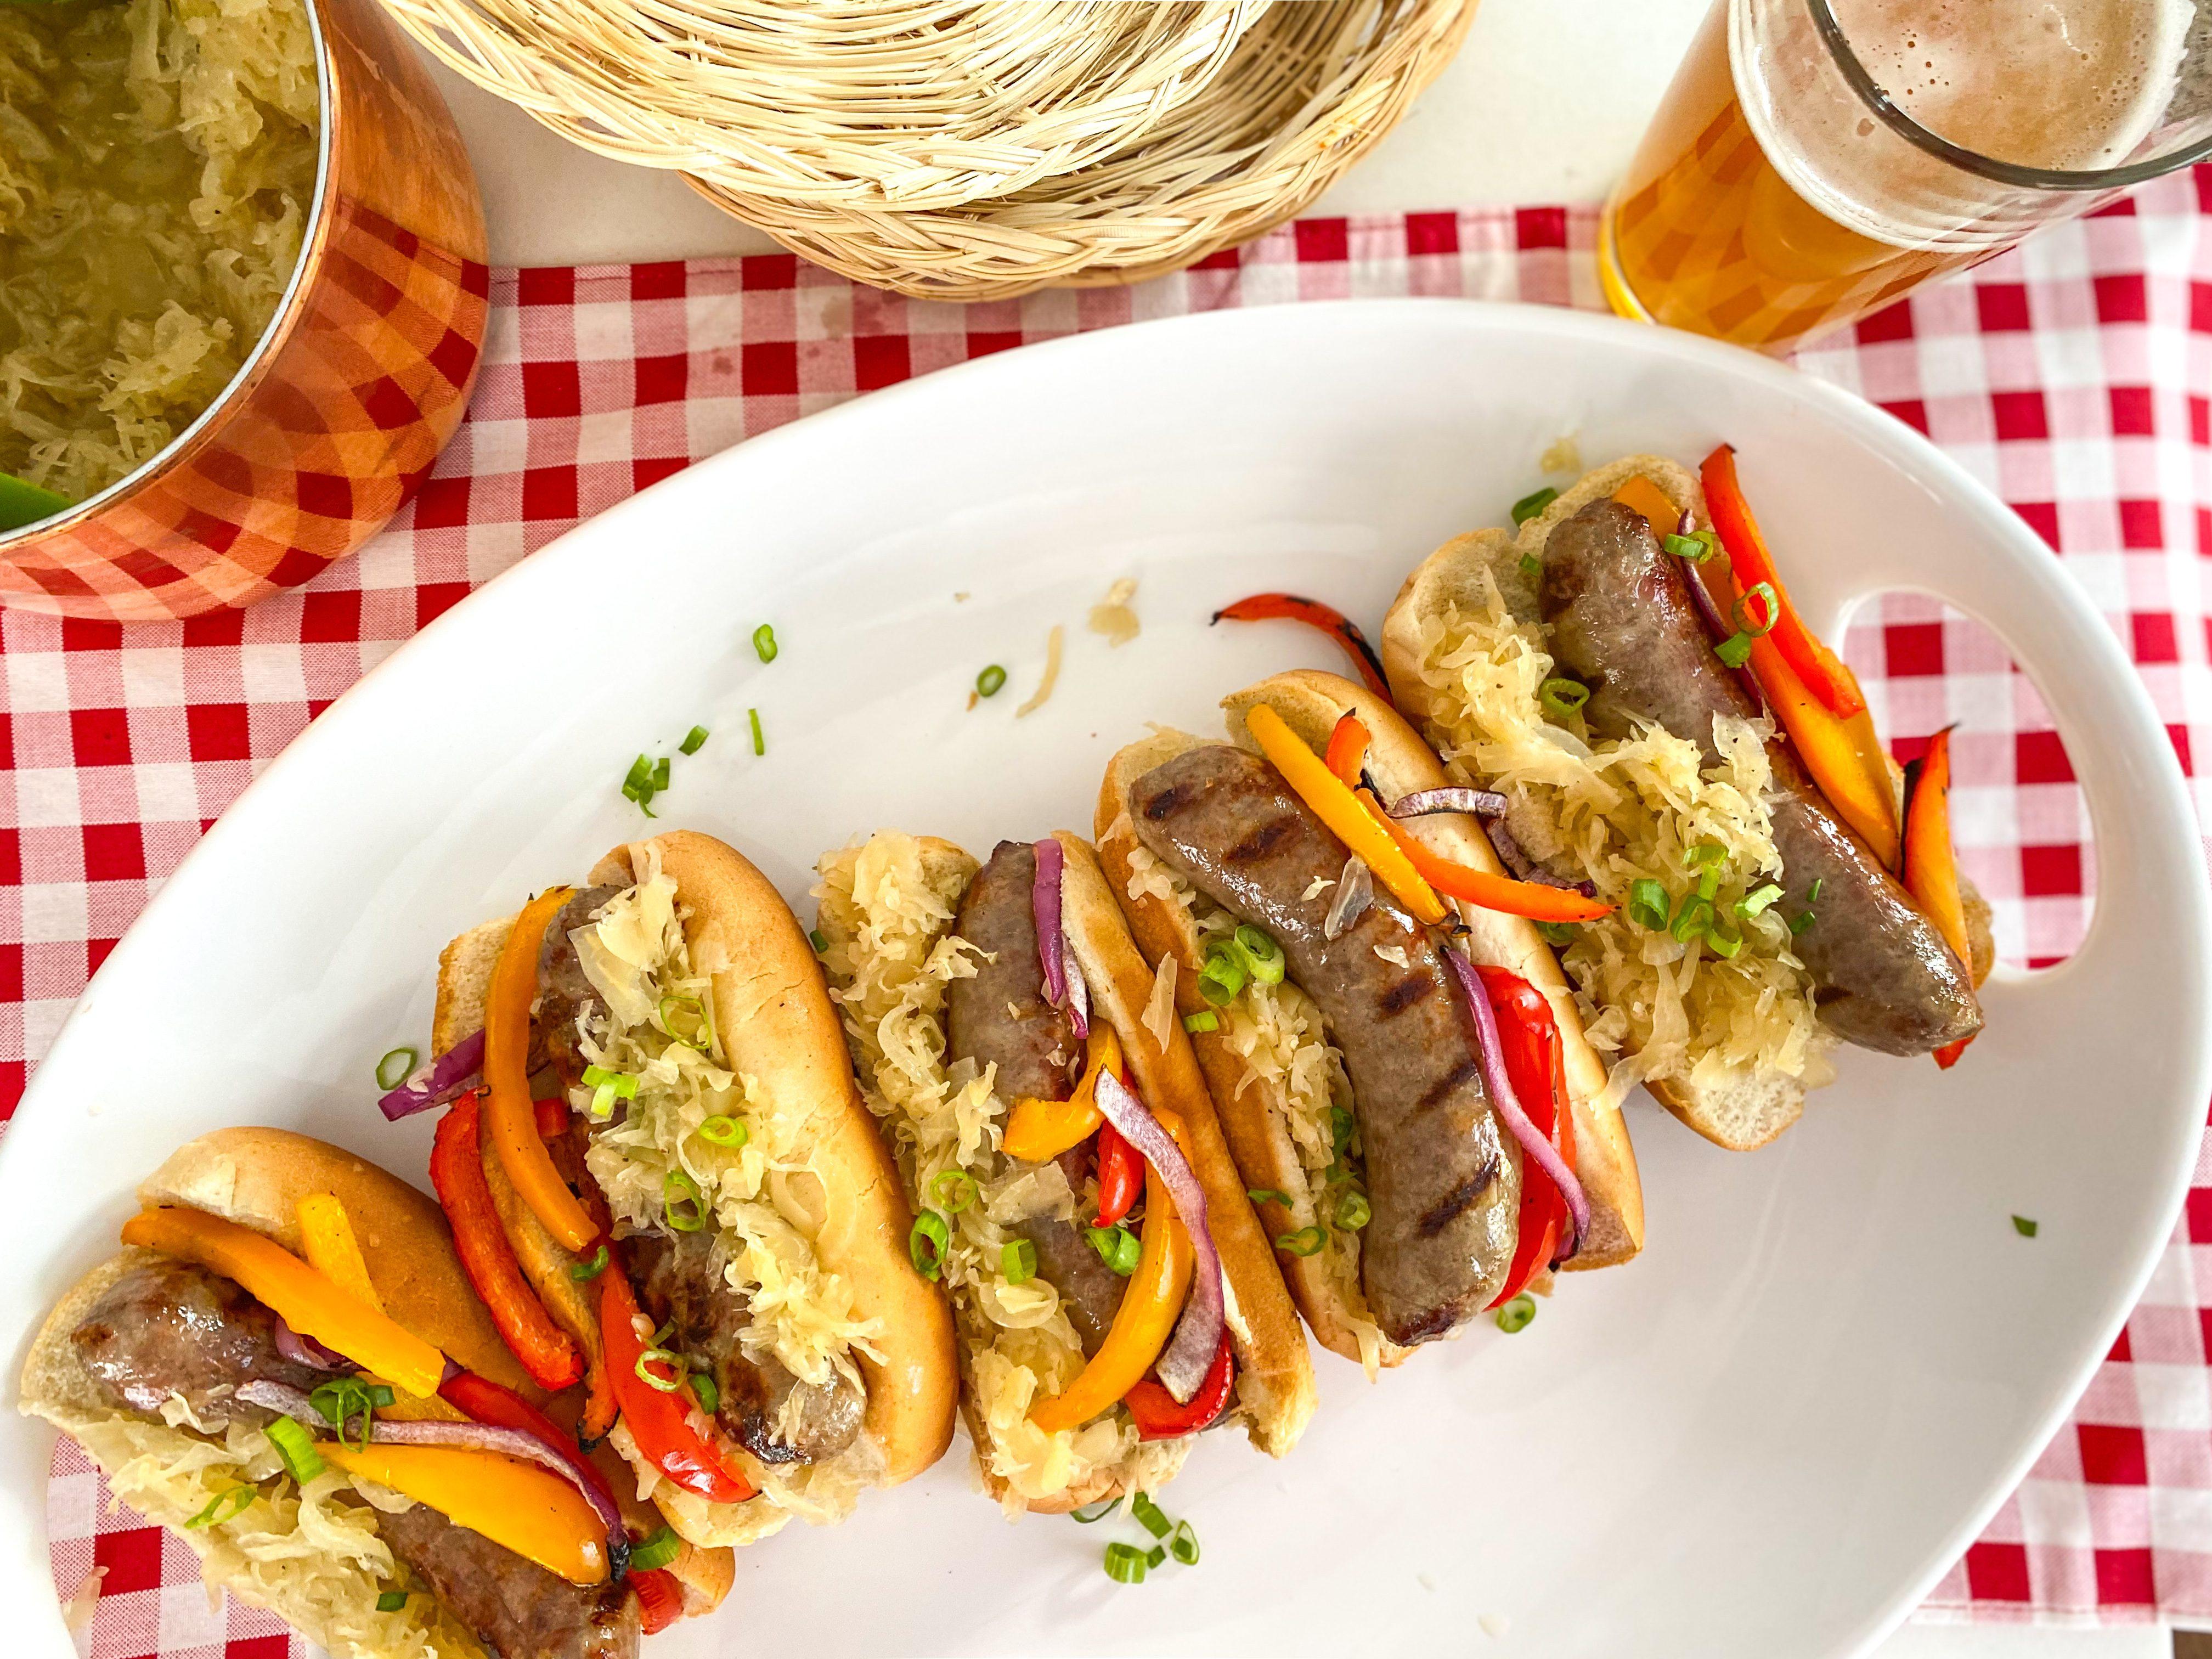 Grilled Bratwursts with IPA Sauerkraut